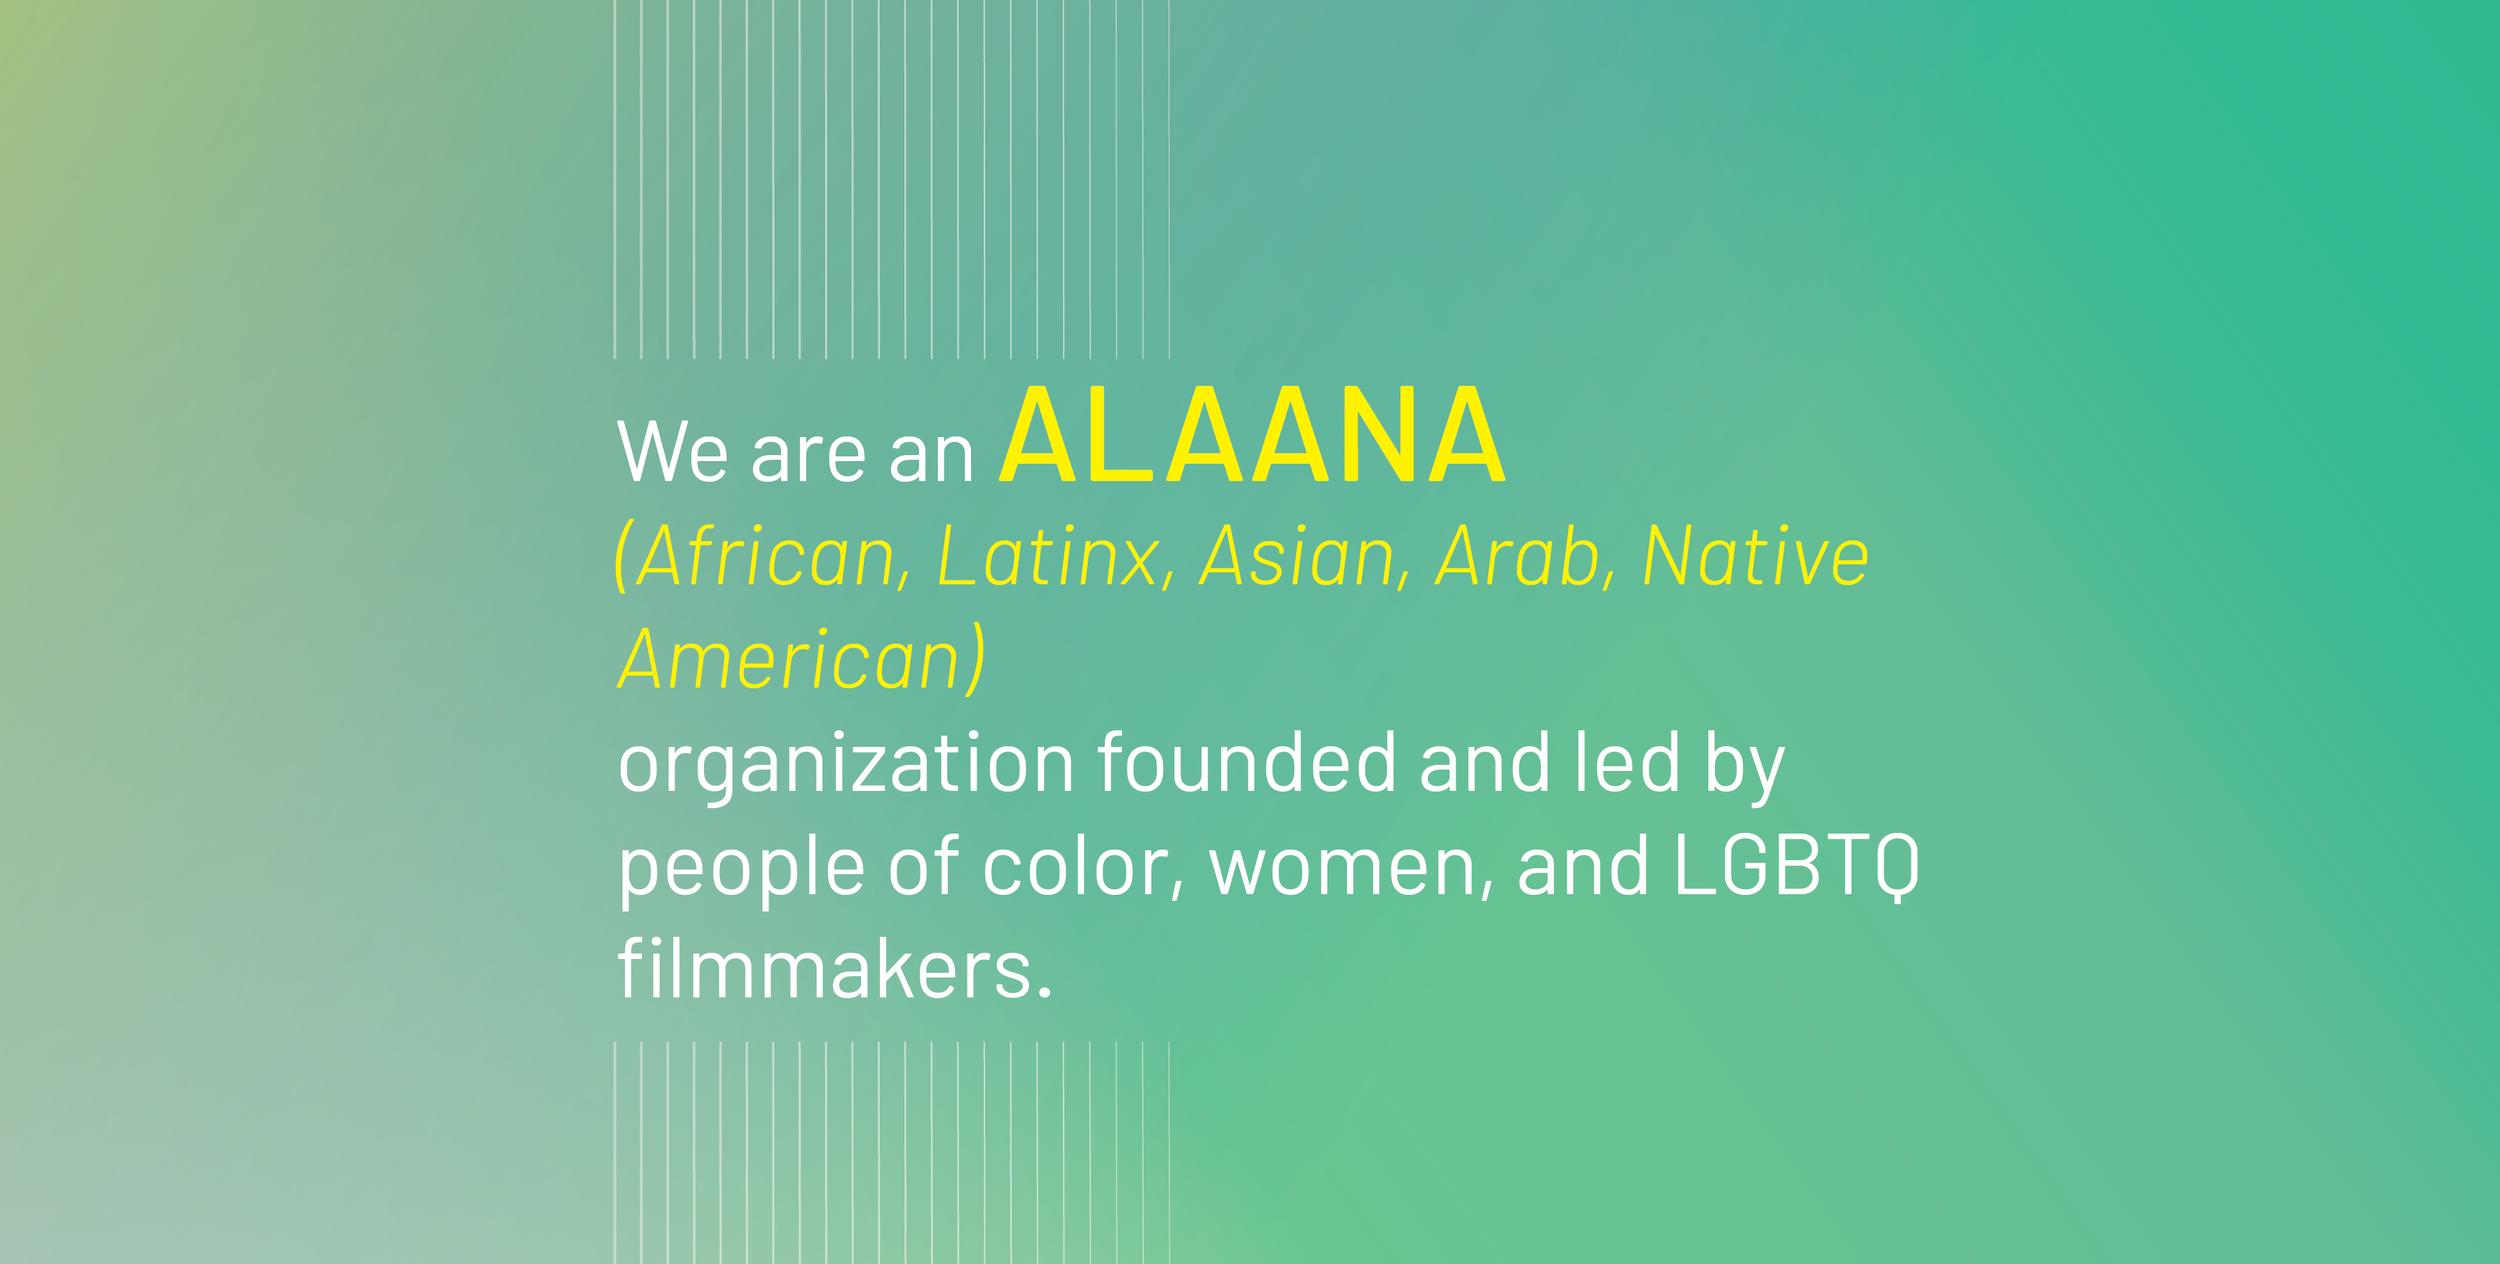 ALAANA_webpage-06-06.png